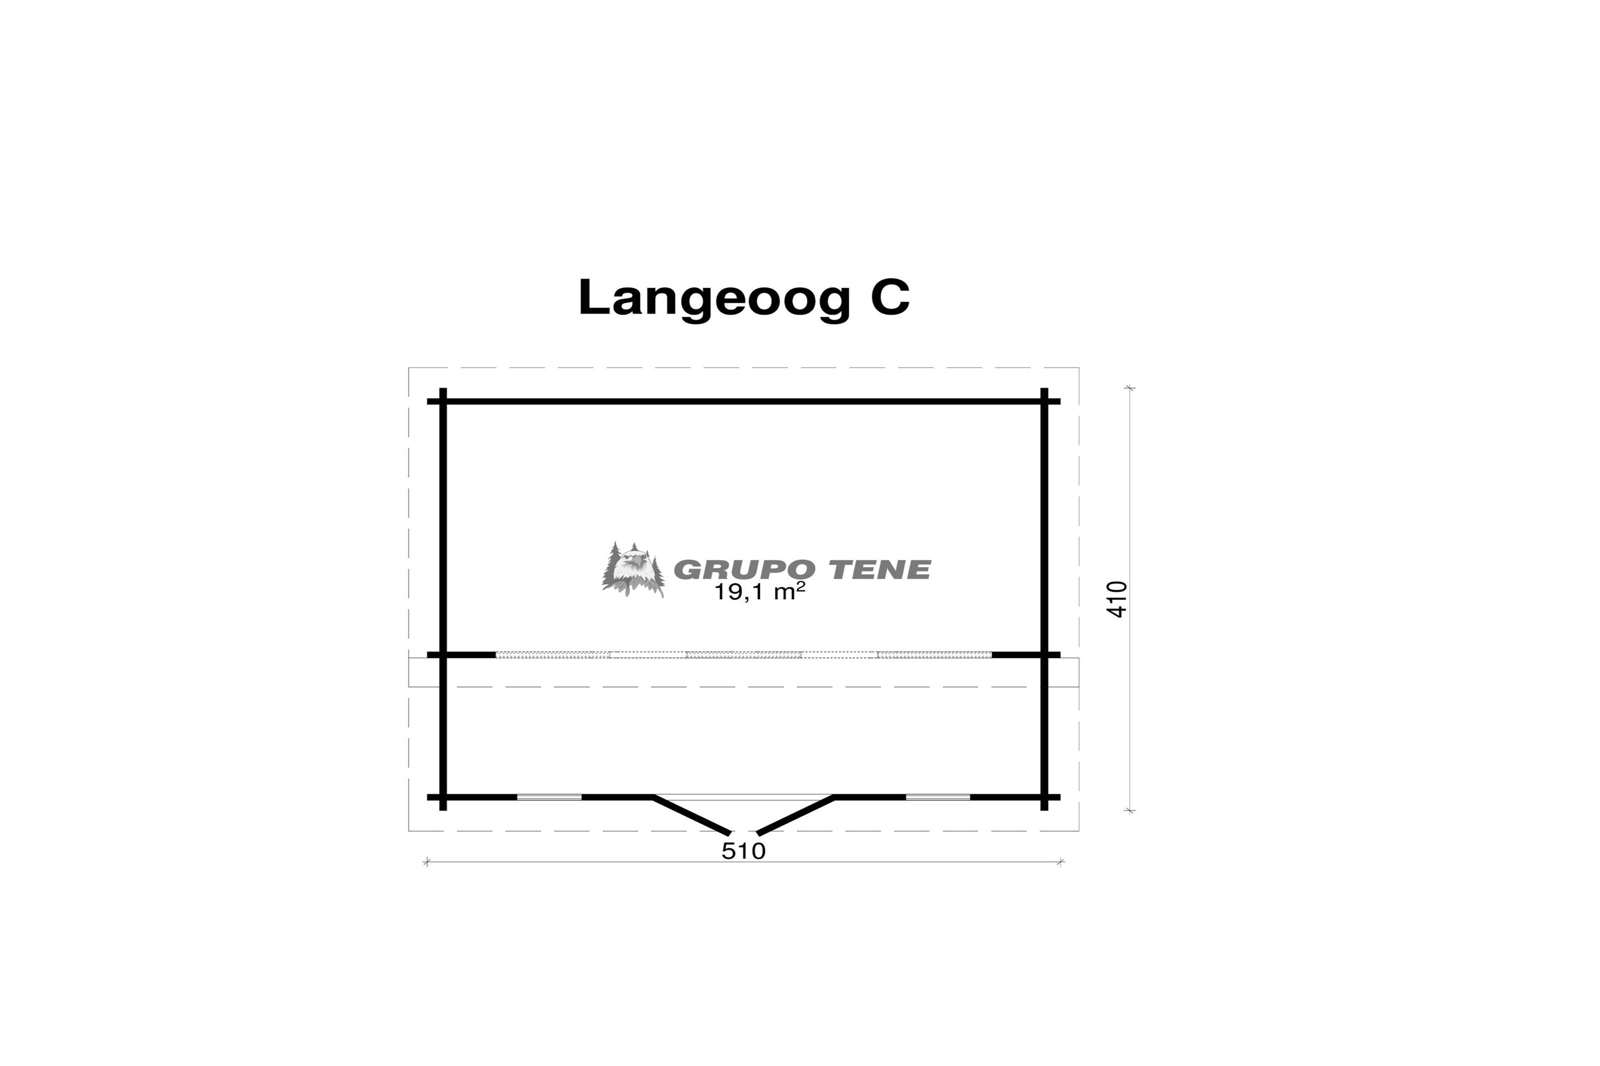 plano langeoog c